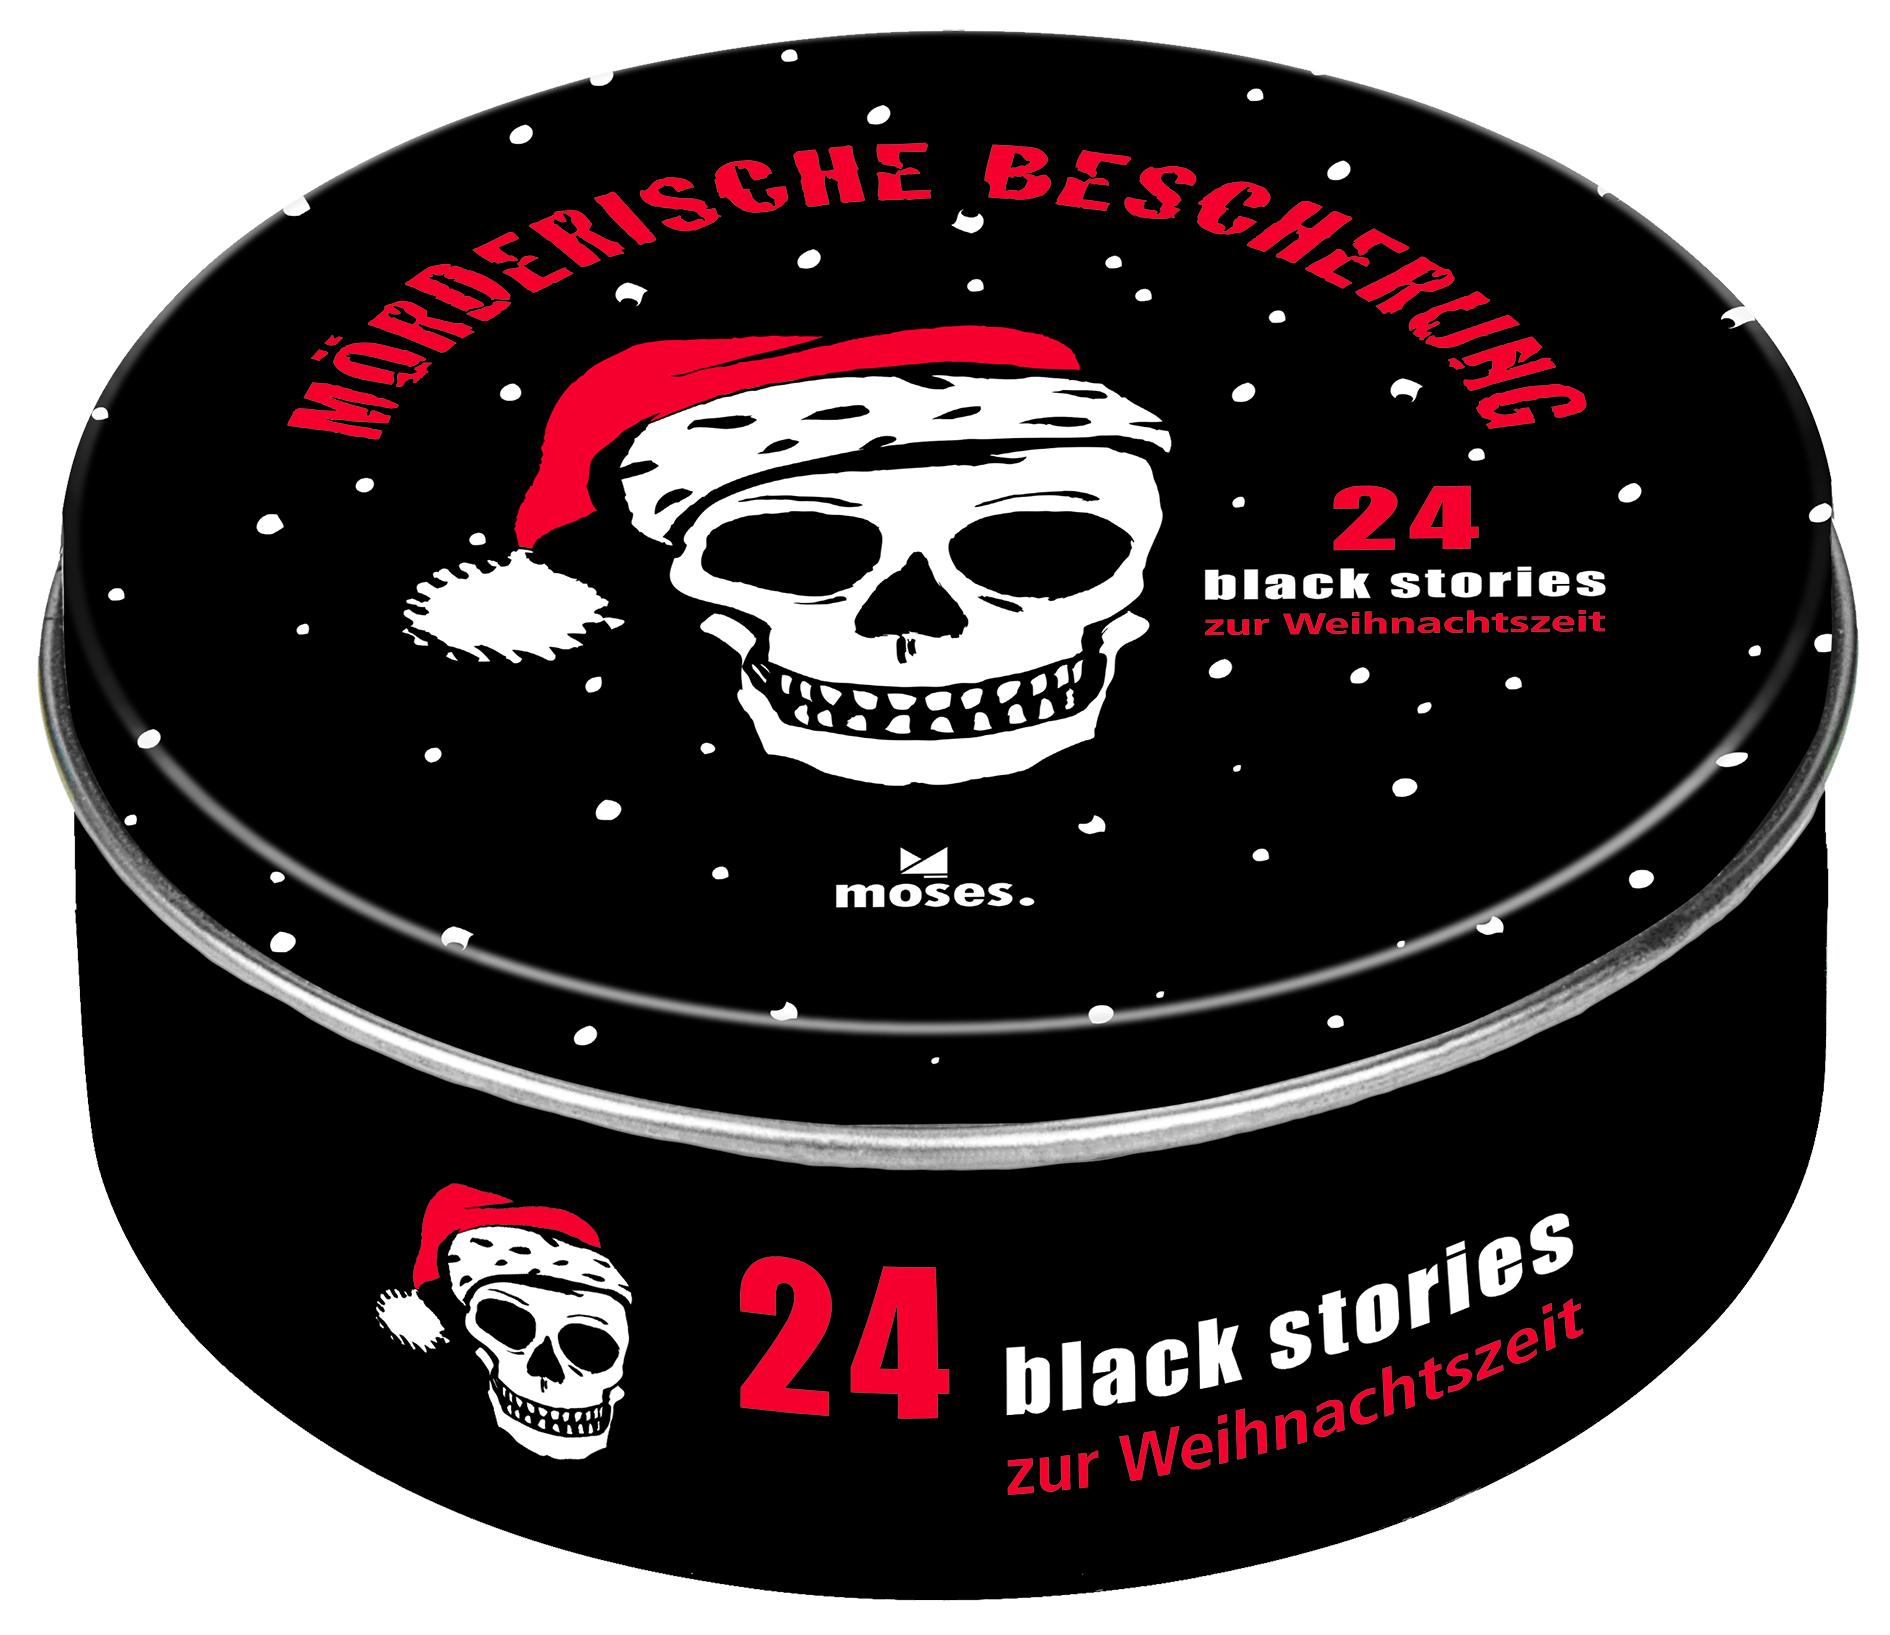 Black Stories Anleitung